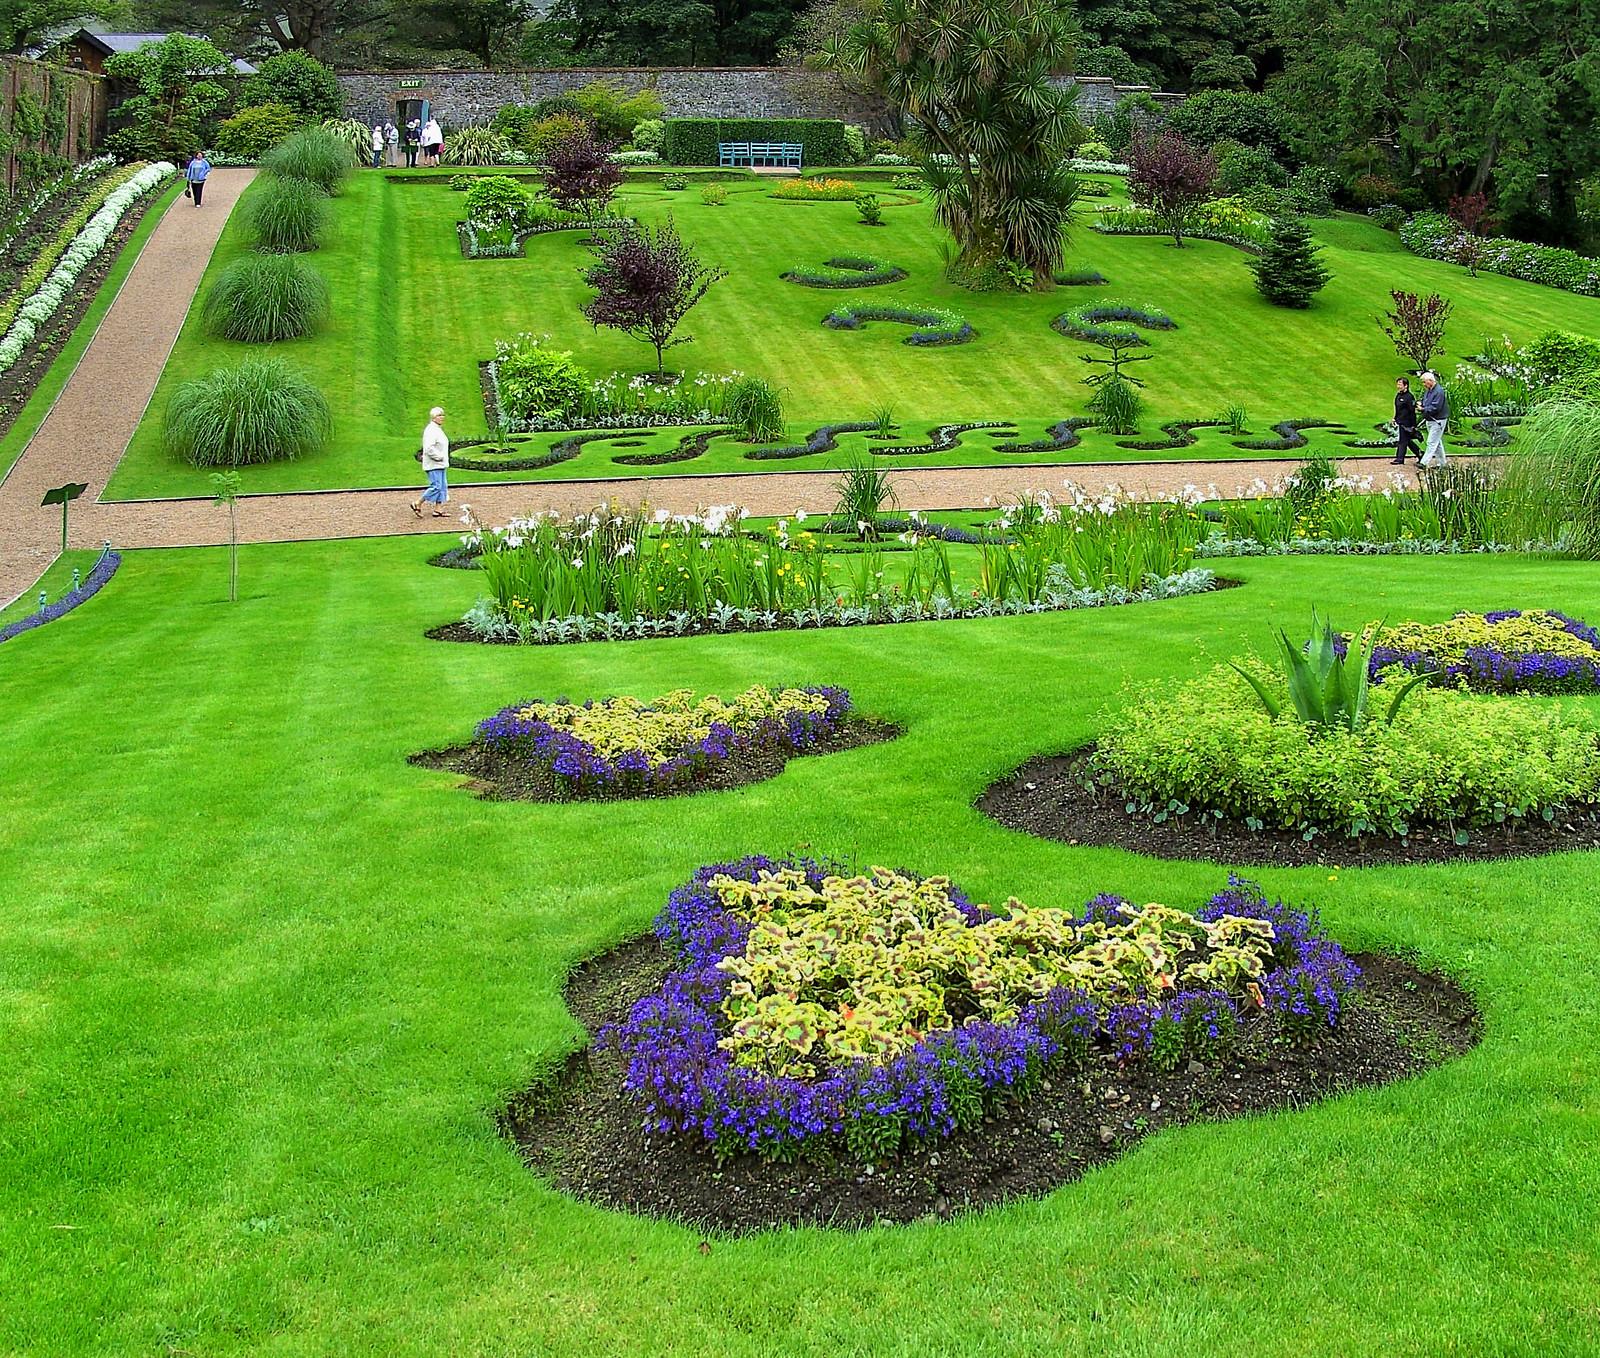 KylemoreAbbey garden. Credit High Contrast